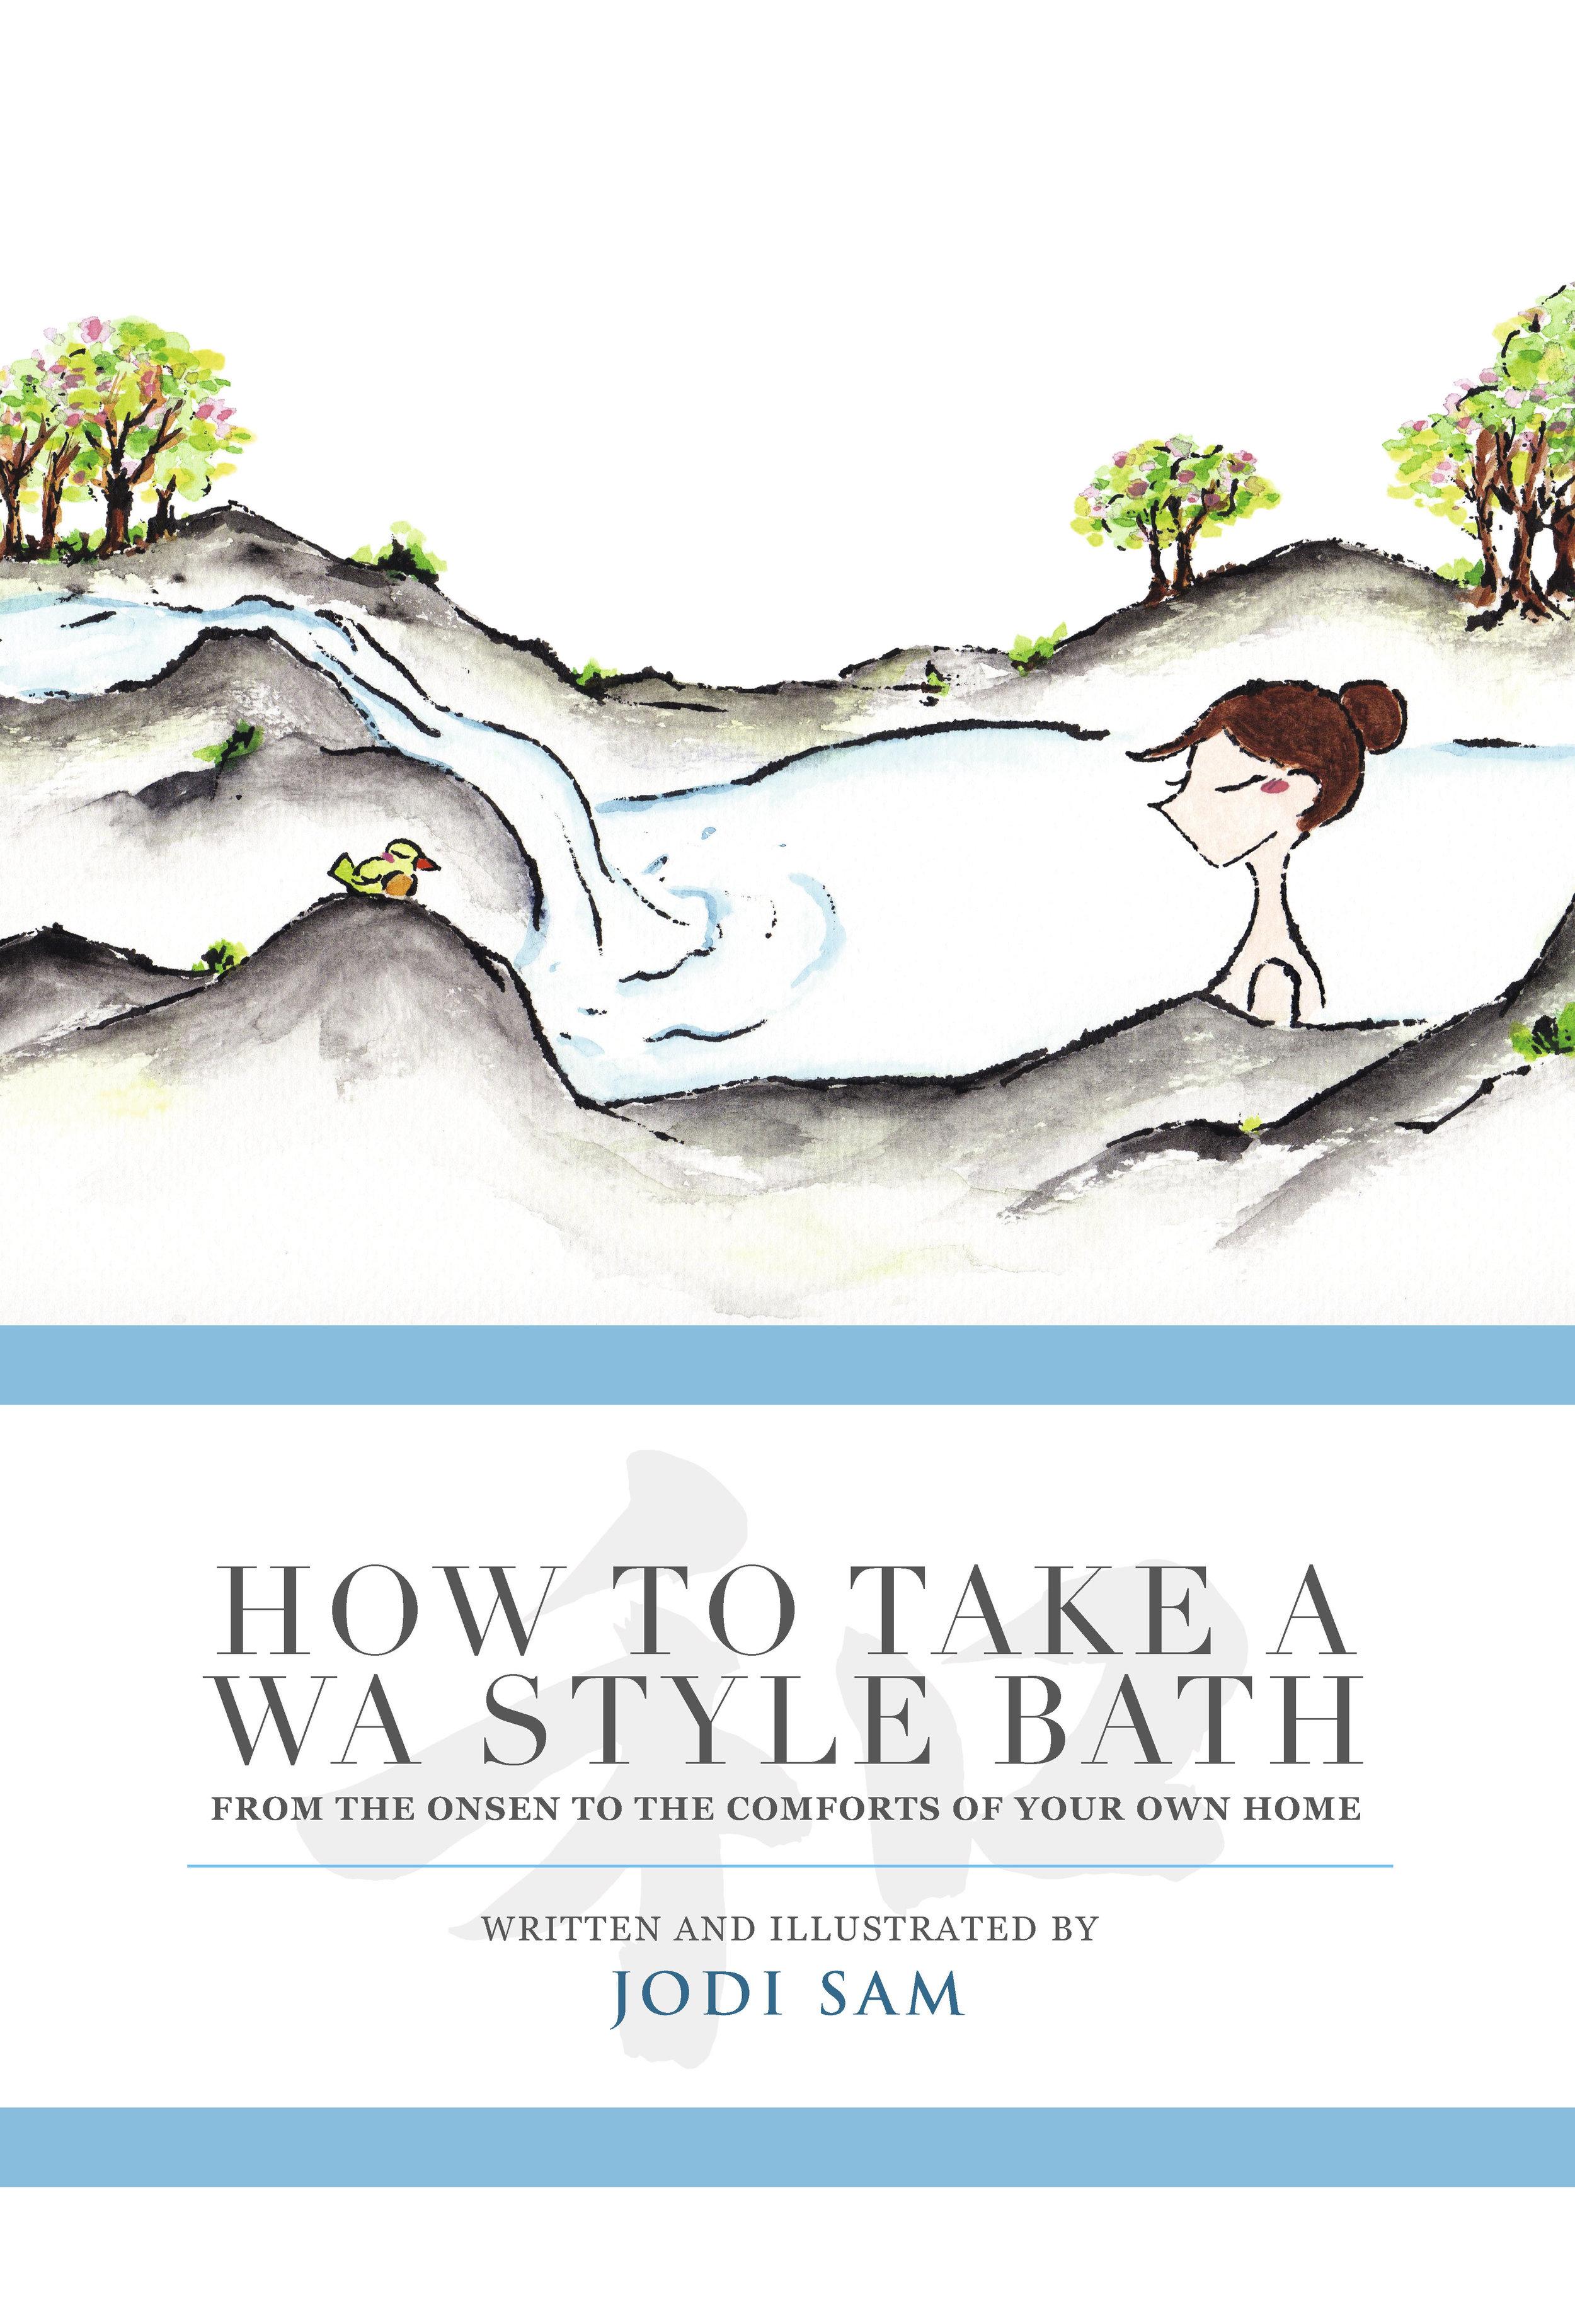 how to take a wa style bath by jodi sam_cover.jpeg